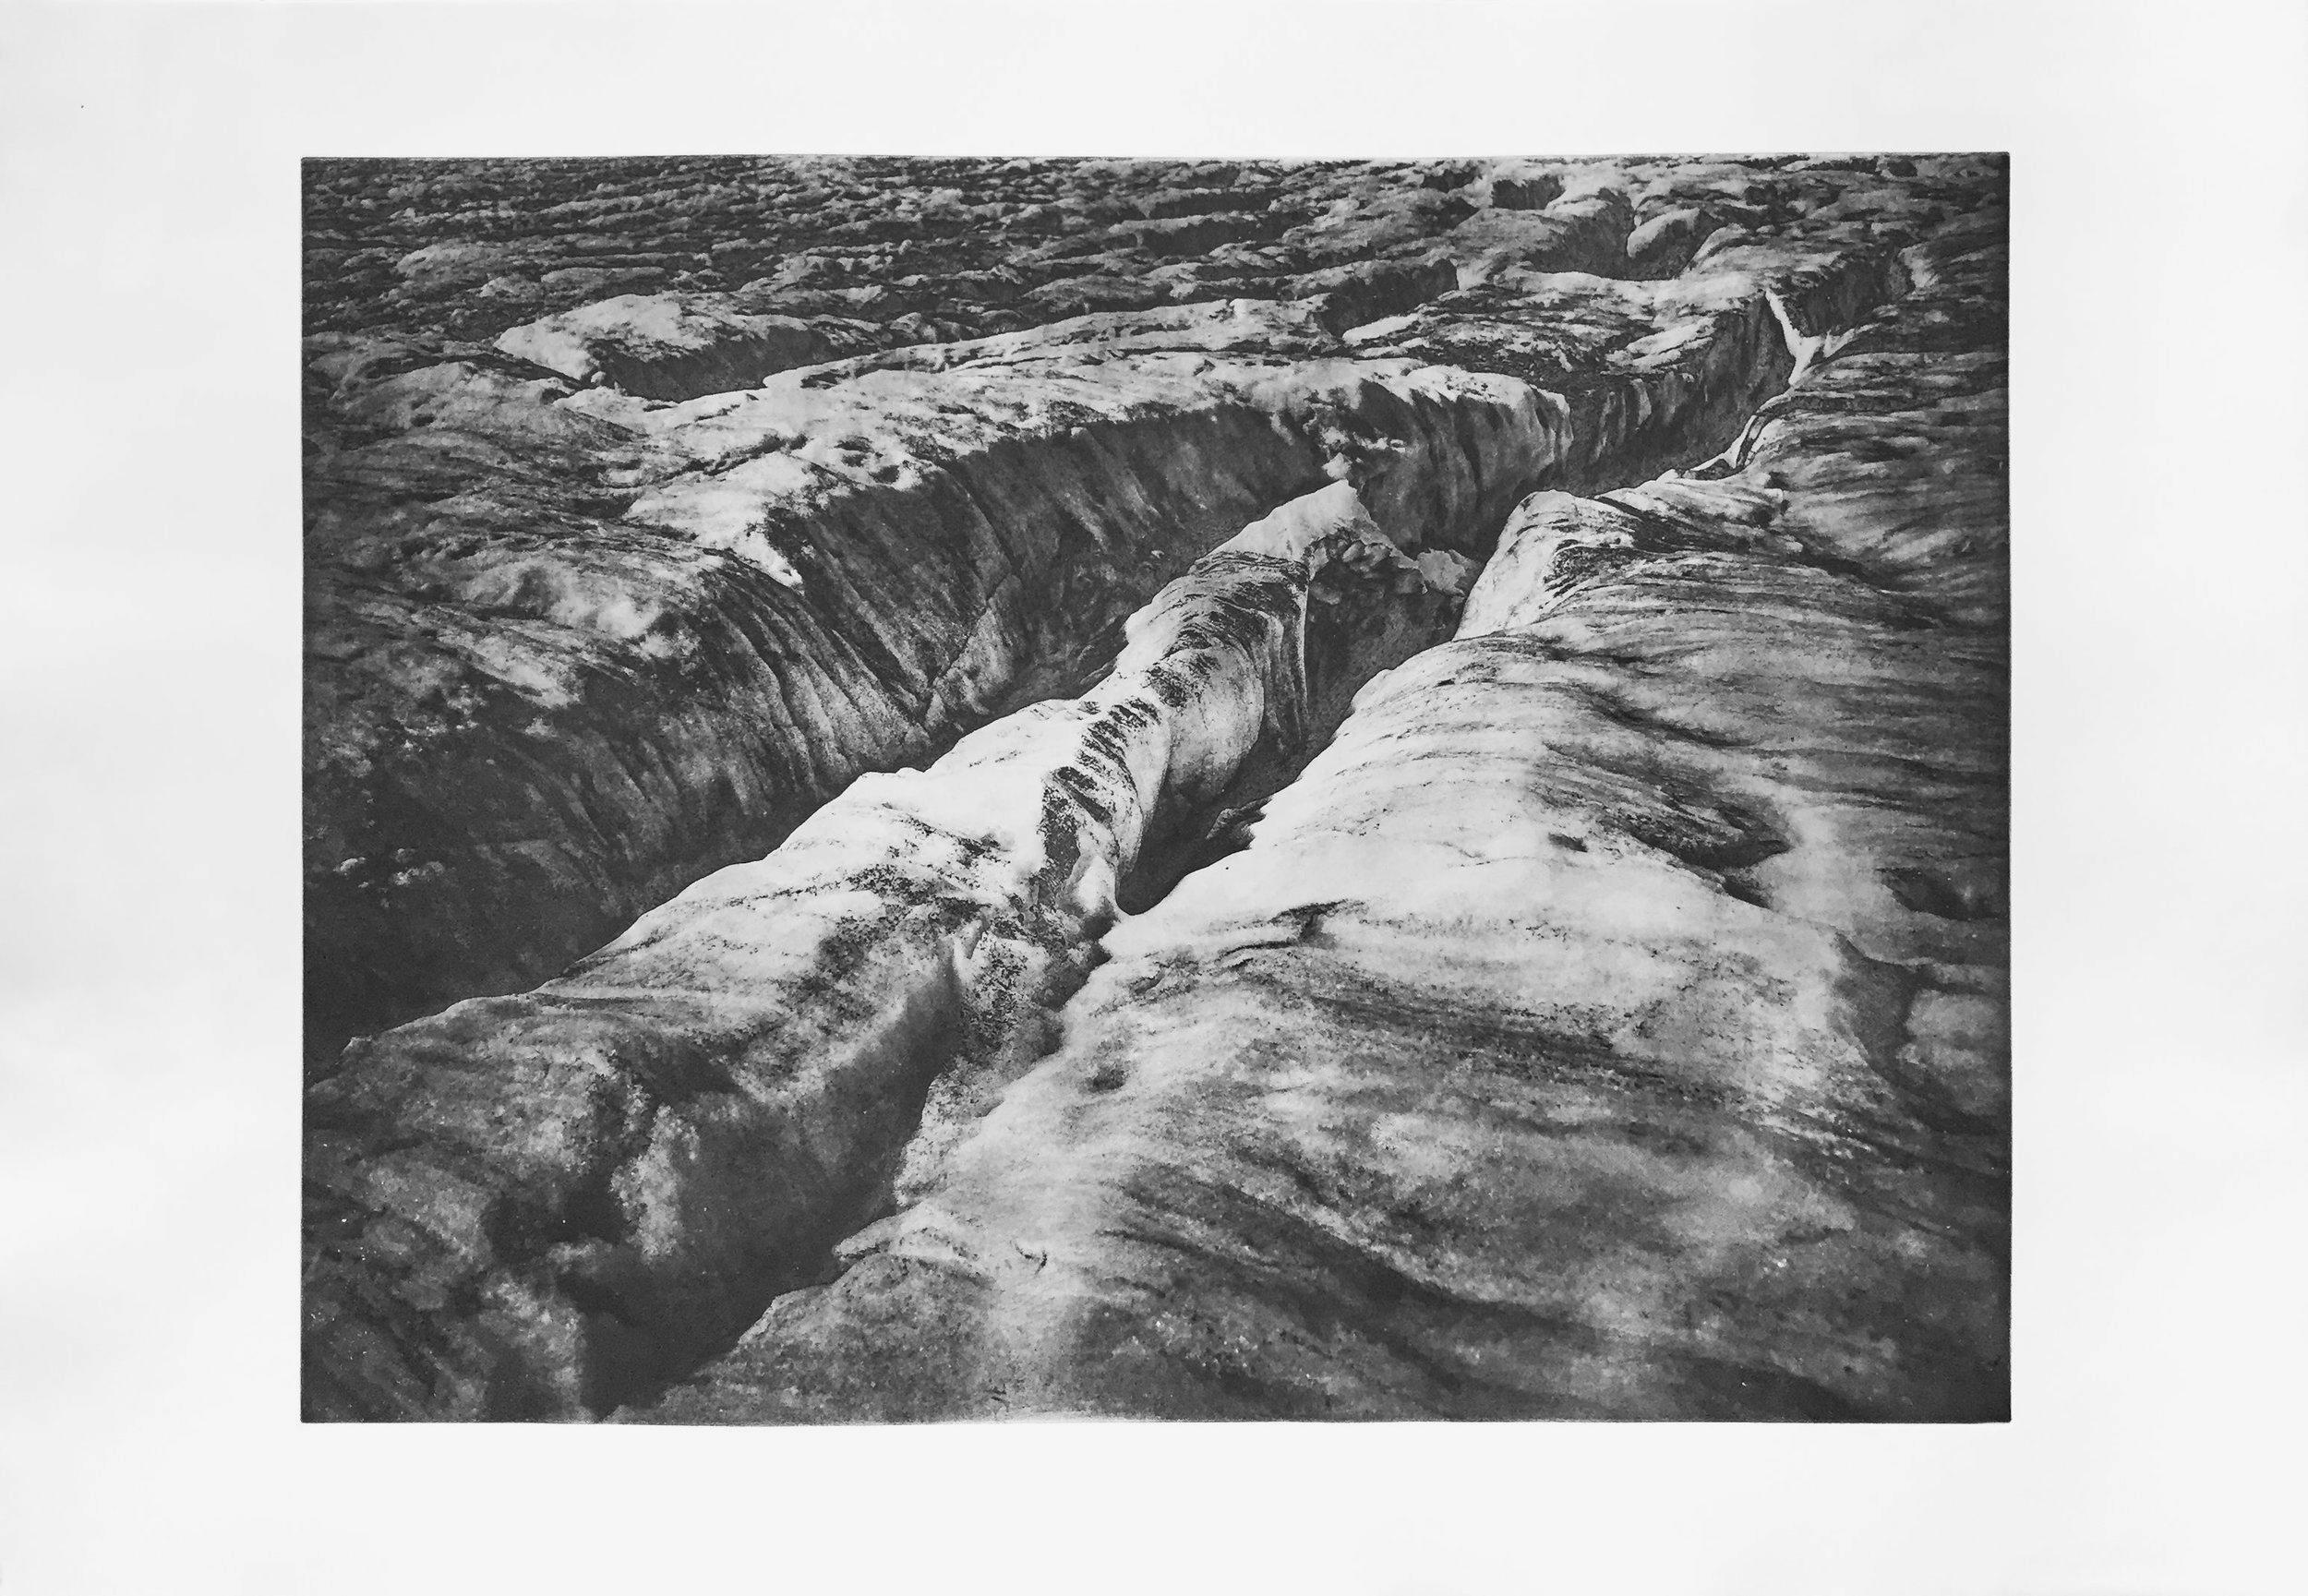 Grindelwald (2016)  medium: Heliogravüre  size: 100 x 70 cm  paper: Zerkall 270 g/qm  plate: 74 x 55 cm  edition: 9 copies  numbered: 1/7 - 7/7, 2 e.a.  printer: FWU